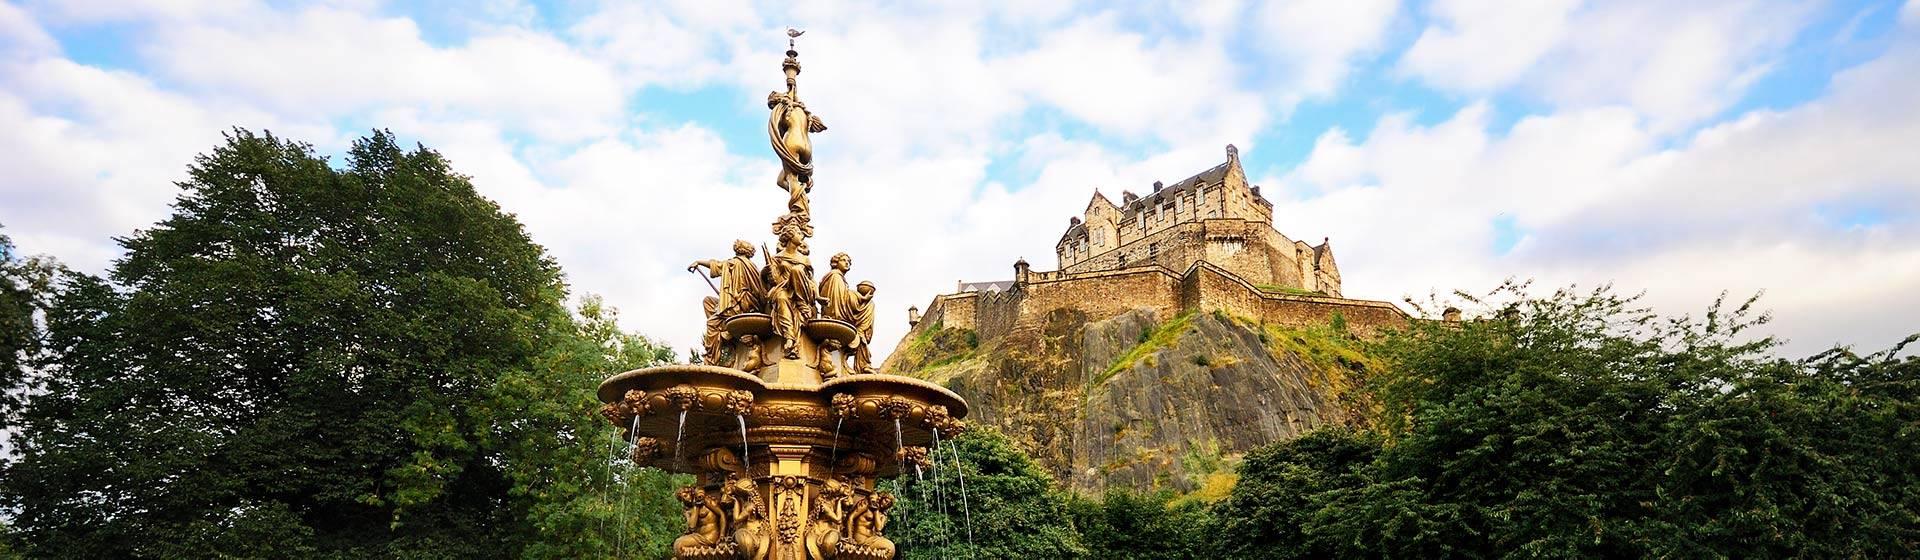 Sights of Scotland